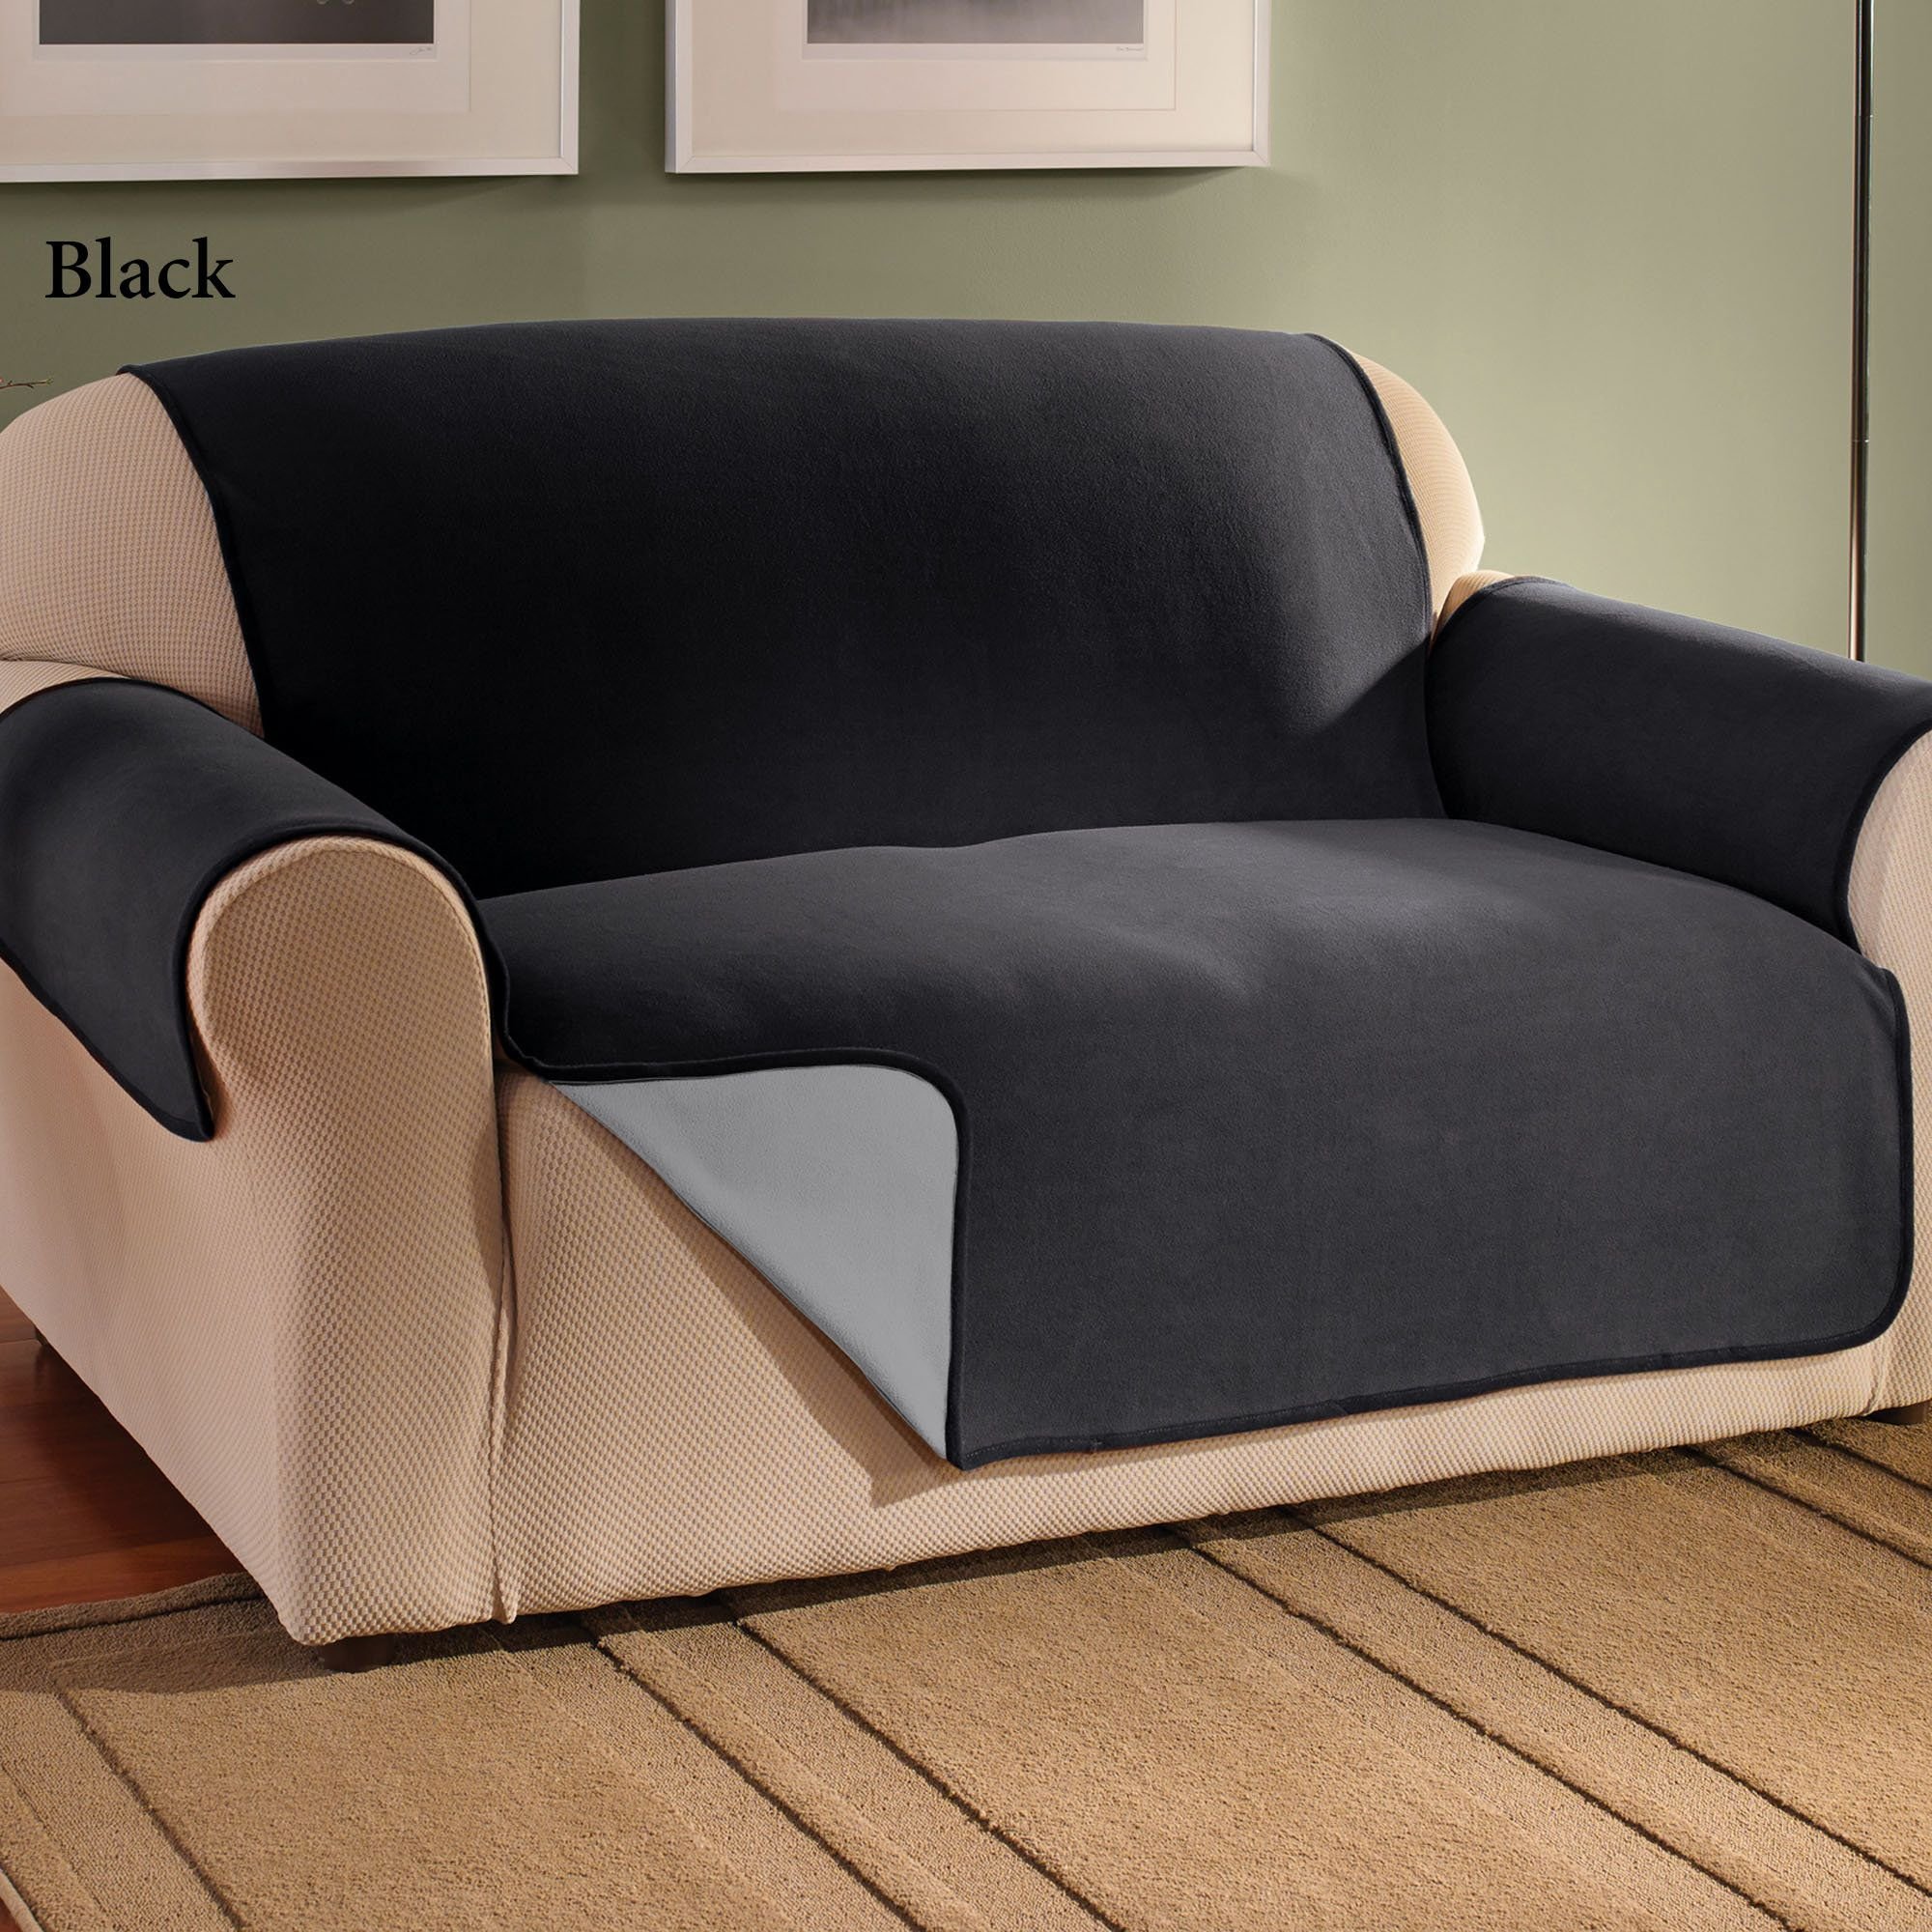 10 Sofa Covers Black Brilliant And Also Interesting